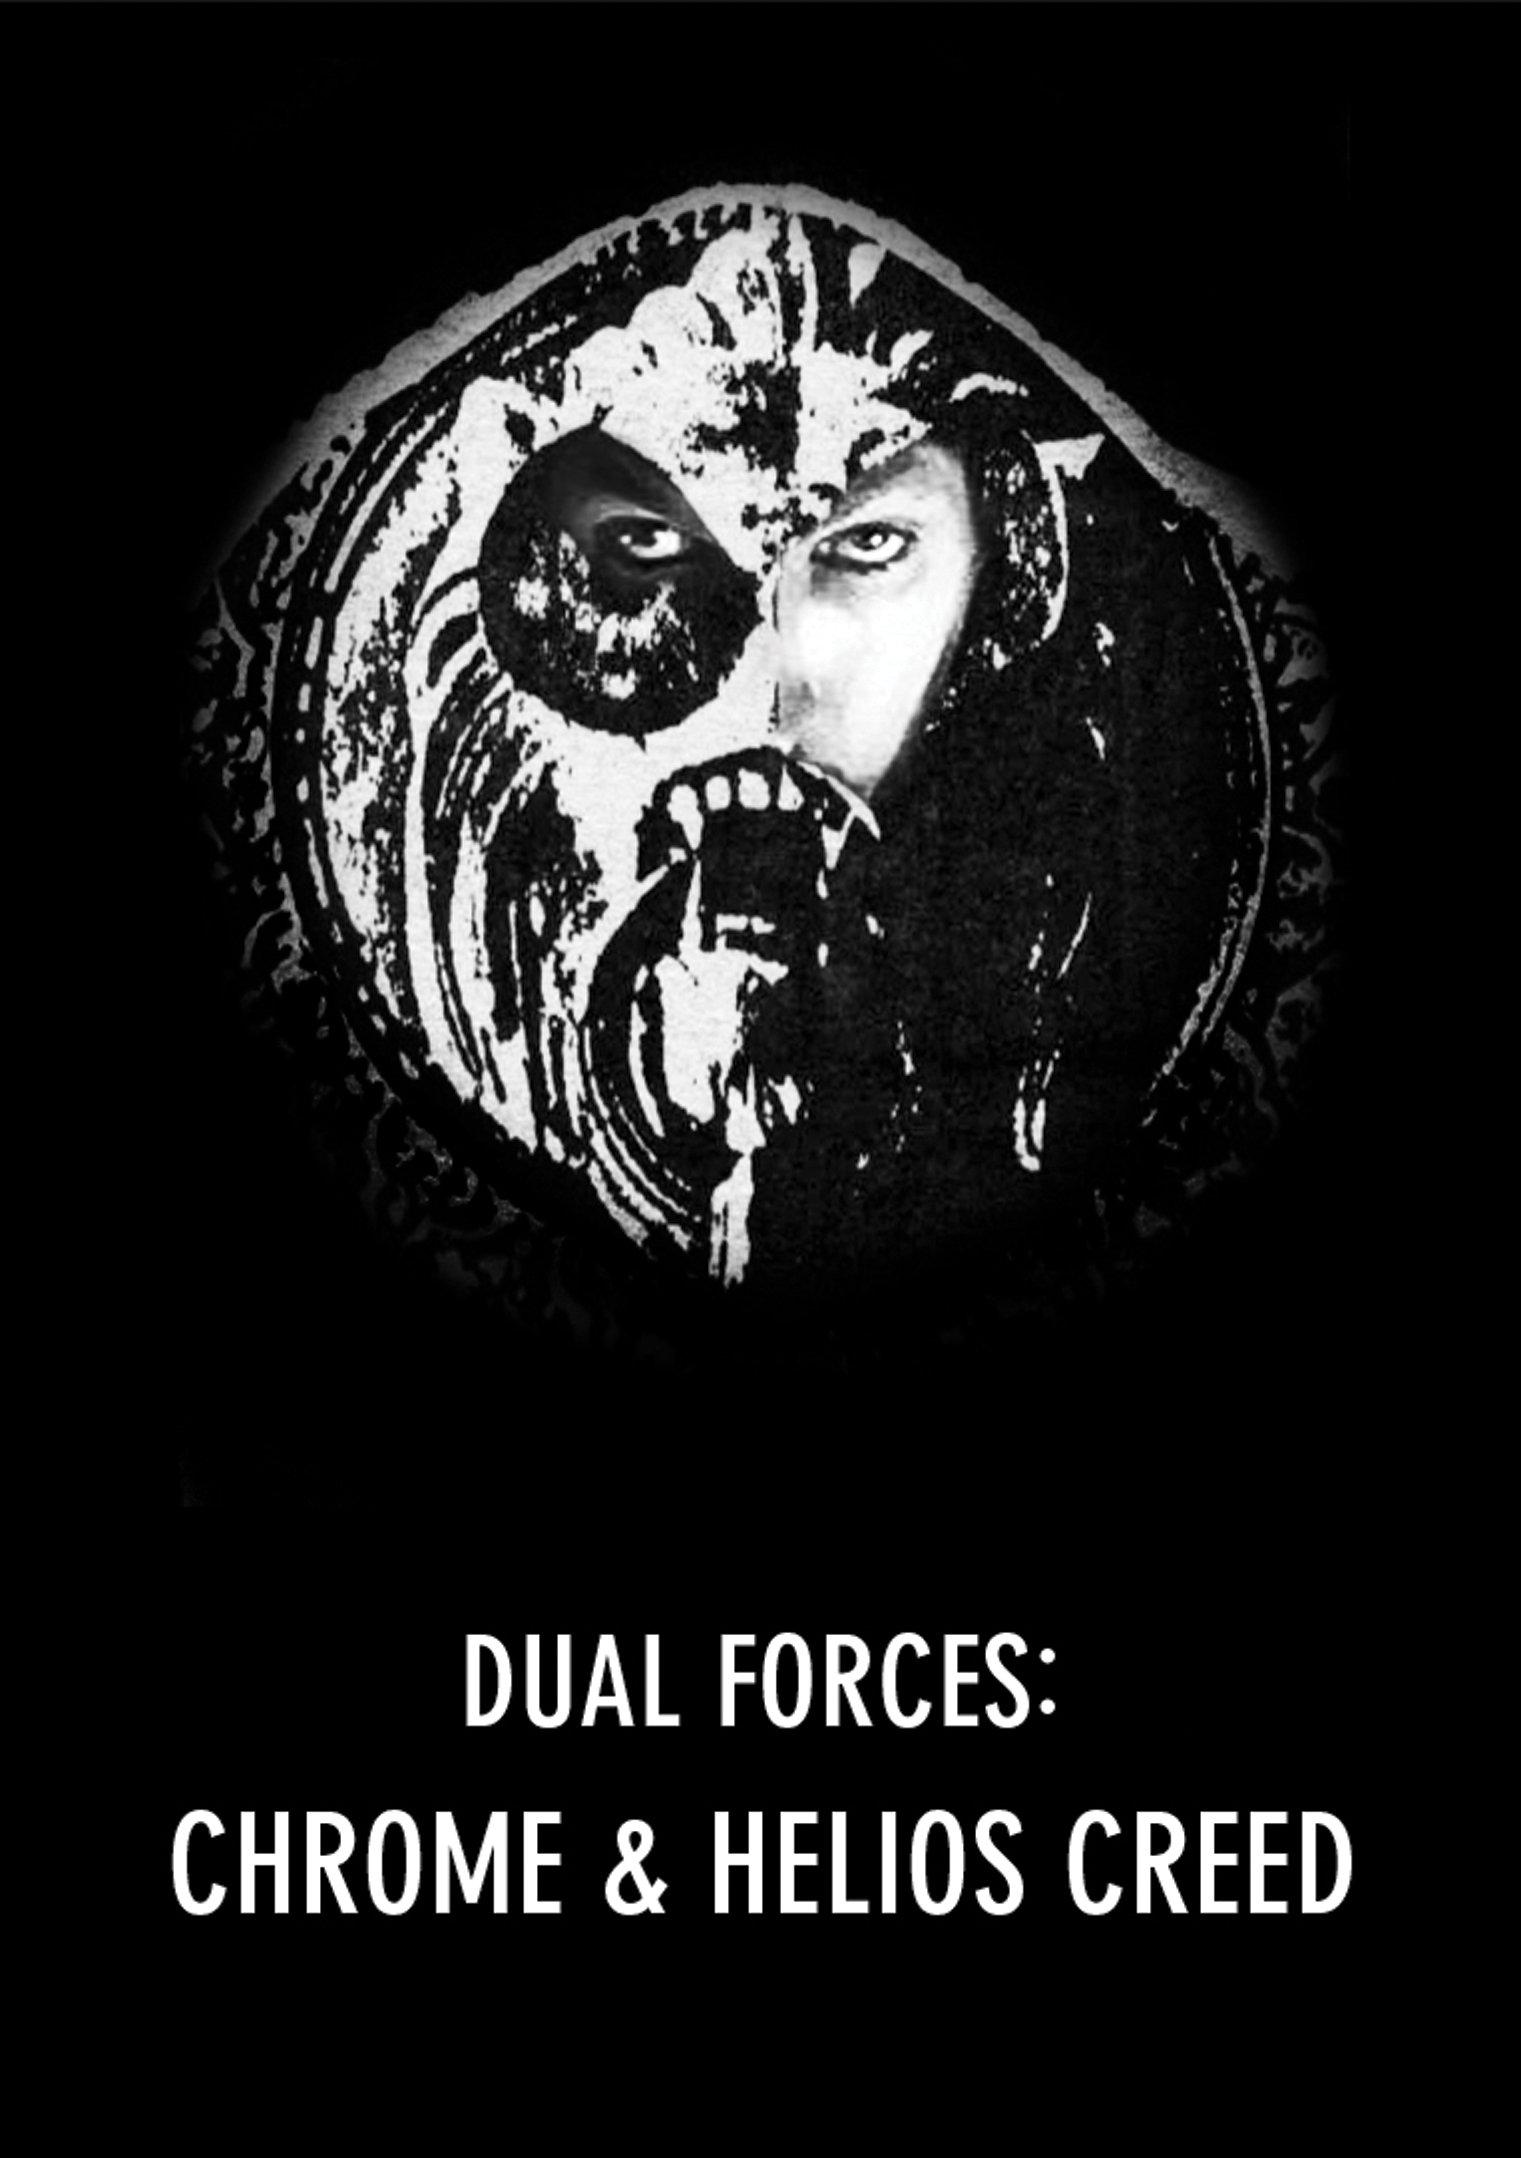 Dual Forces by Mvd Visual